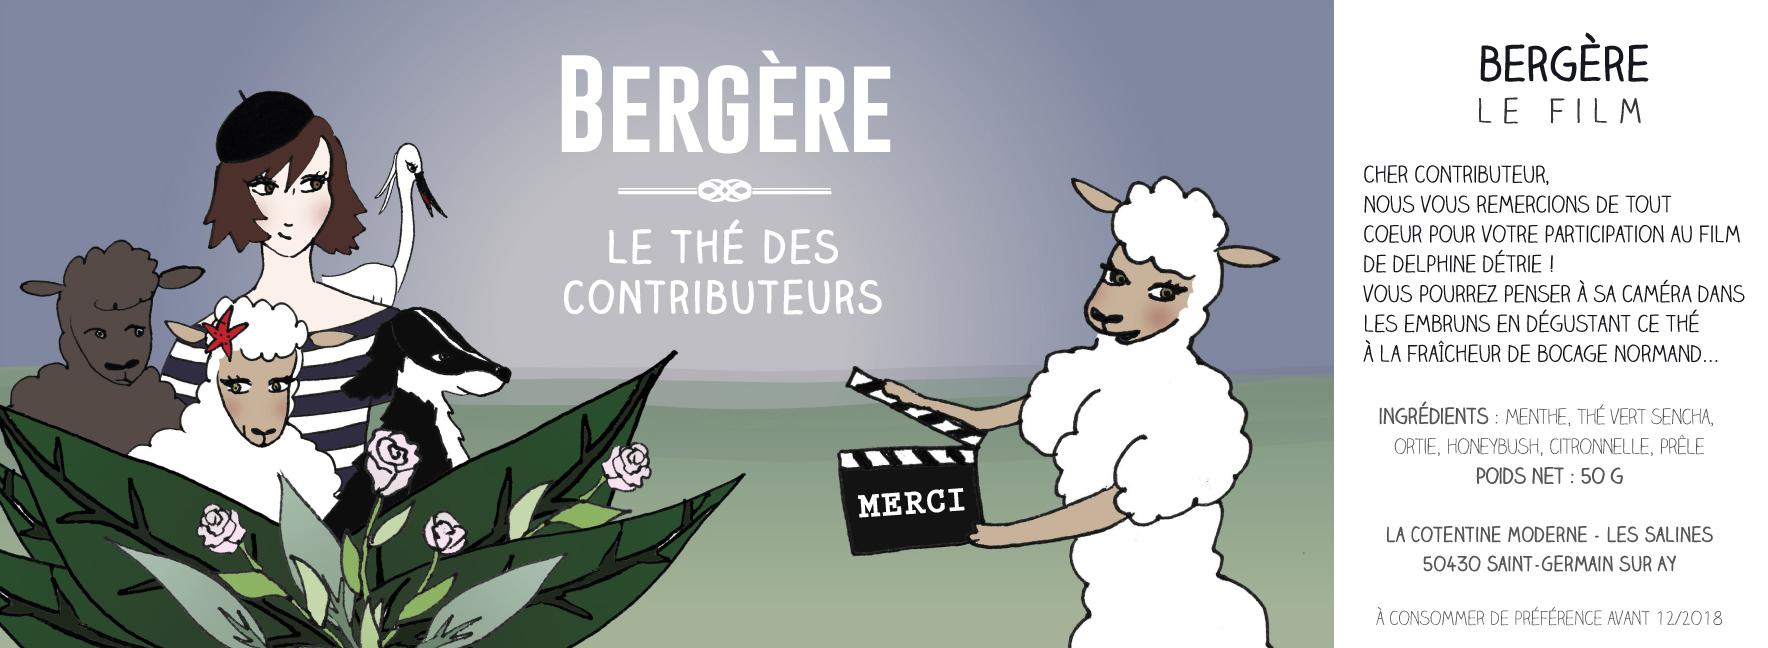 e_tiquette_the__Berge_re-1463648034.jpg